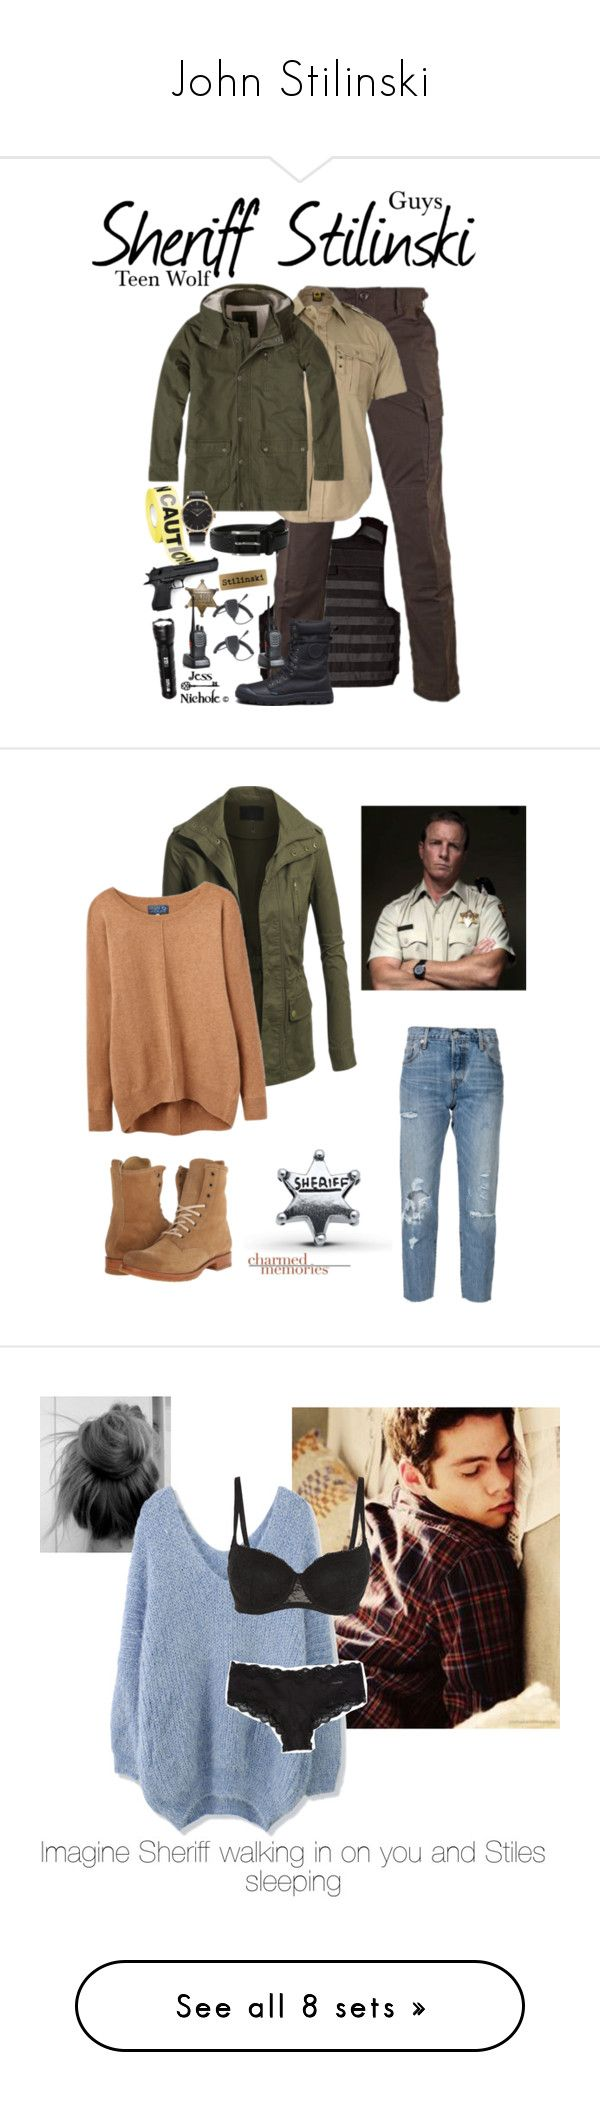 """John Stilinski"" by samtiritilli ❤ liked on Polyvore featuring 5.11 Tactical, prAna, Stacy Adams, Locman, men's fashion, menswear, Levi's, Joules, Frye and Chicwish"